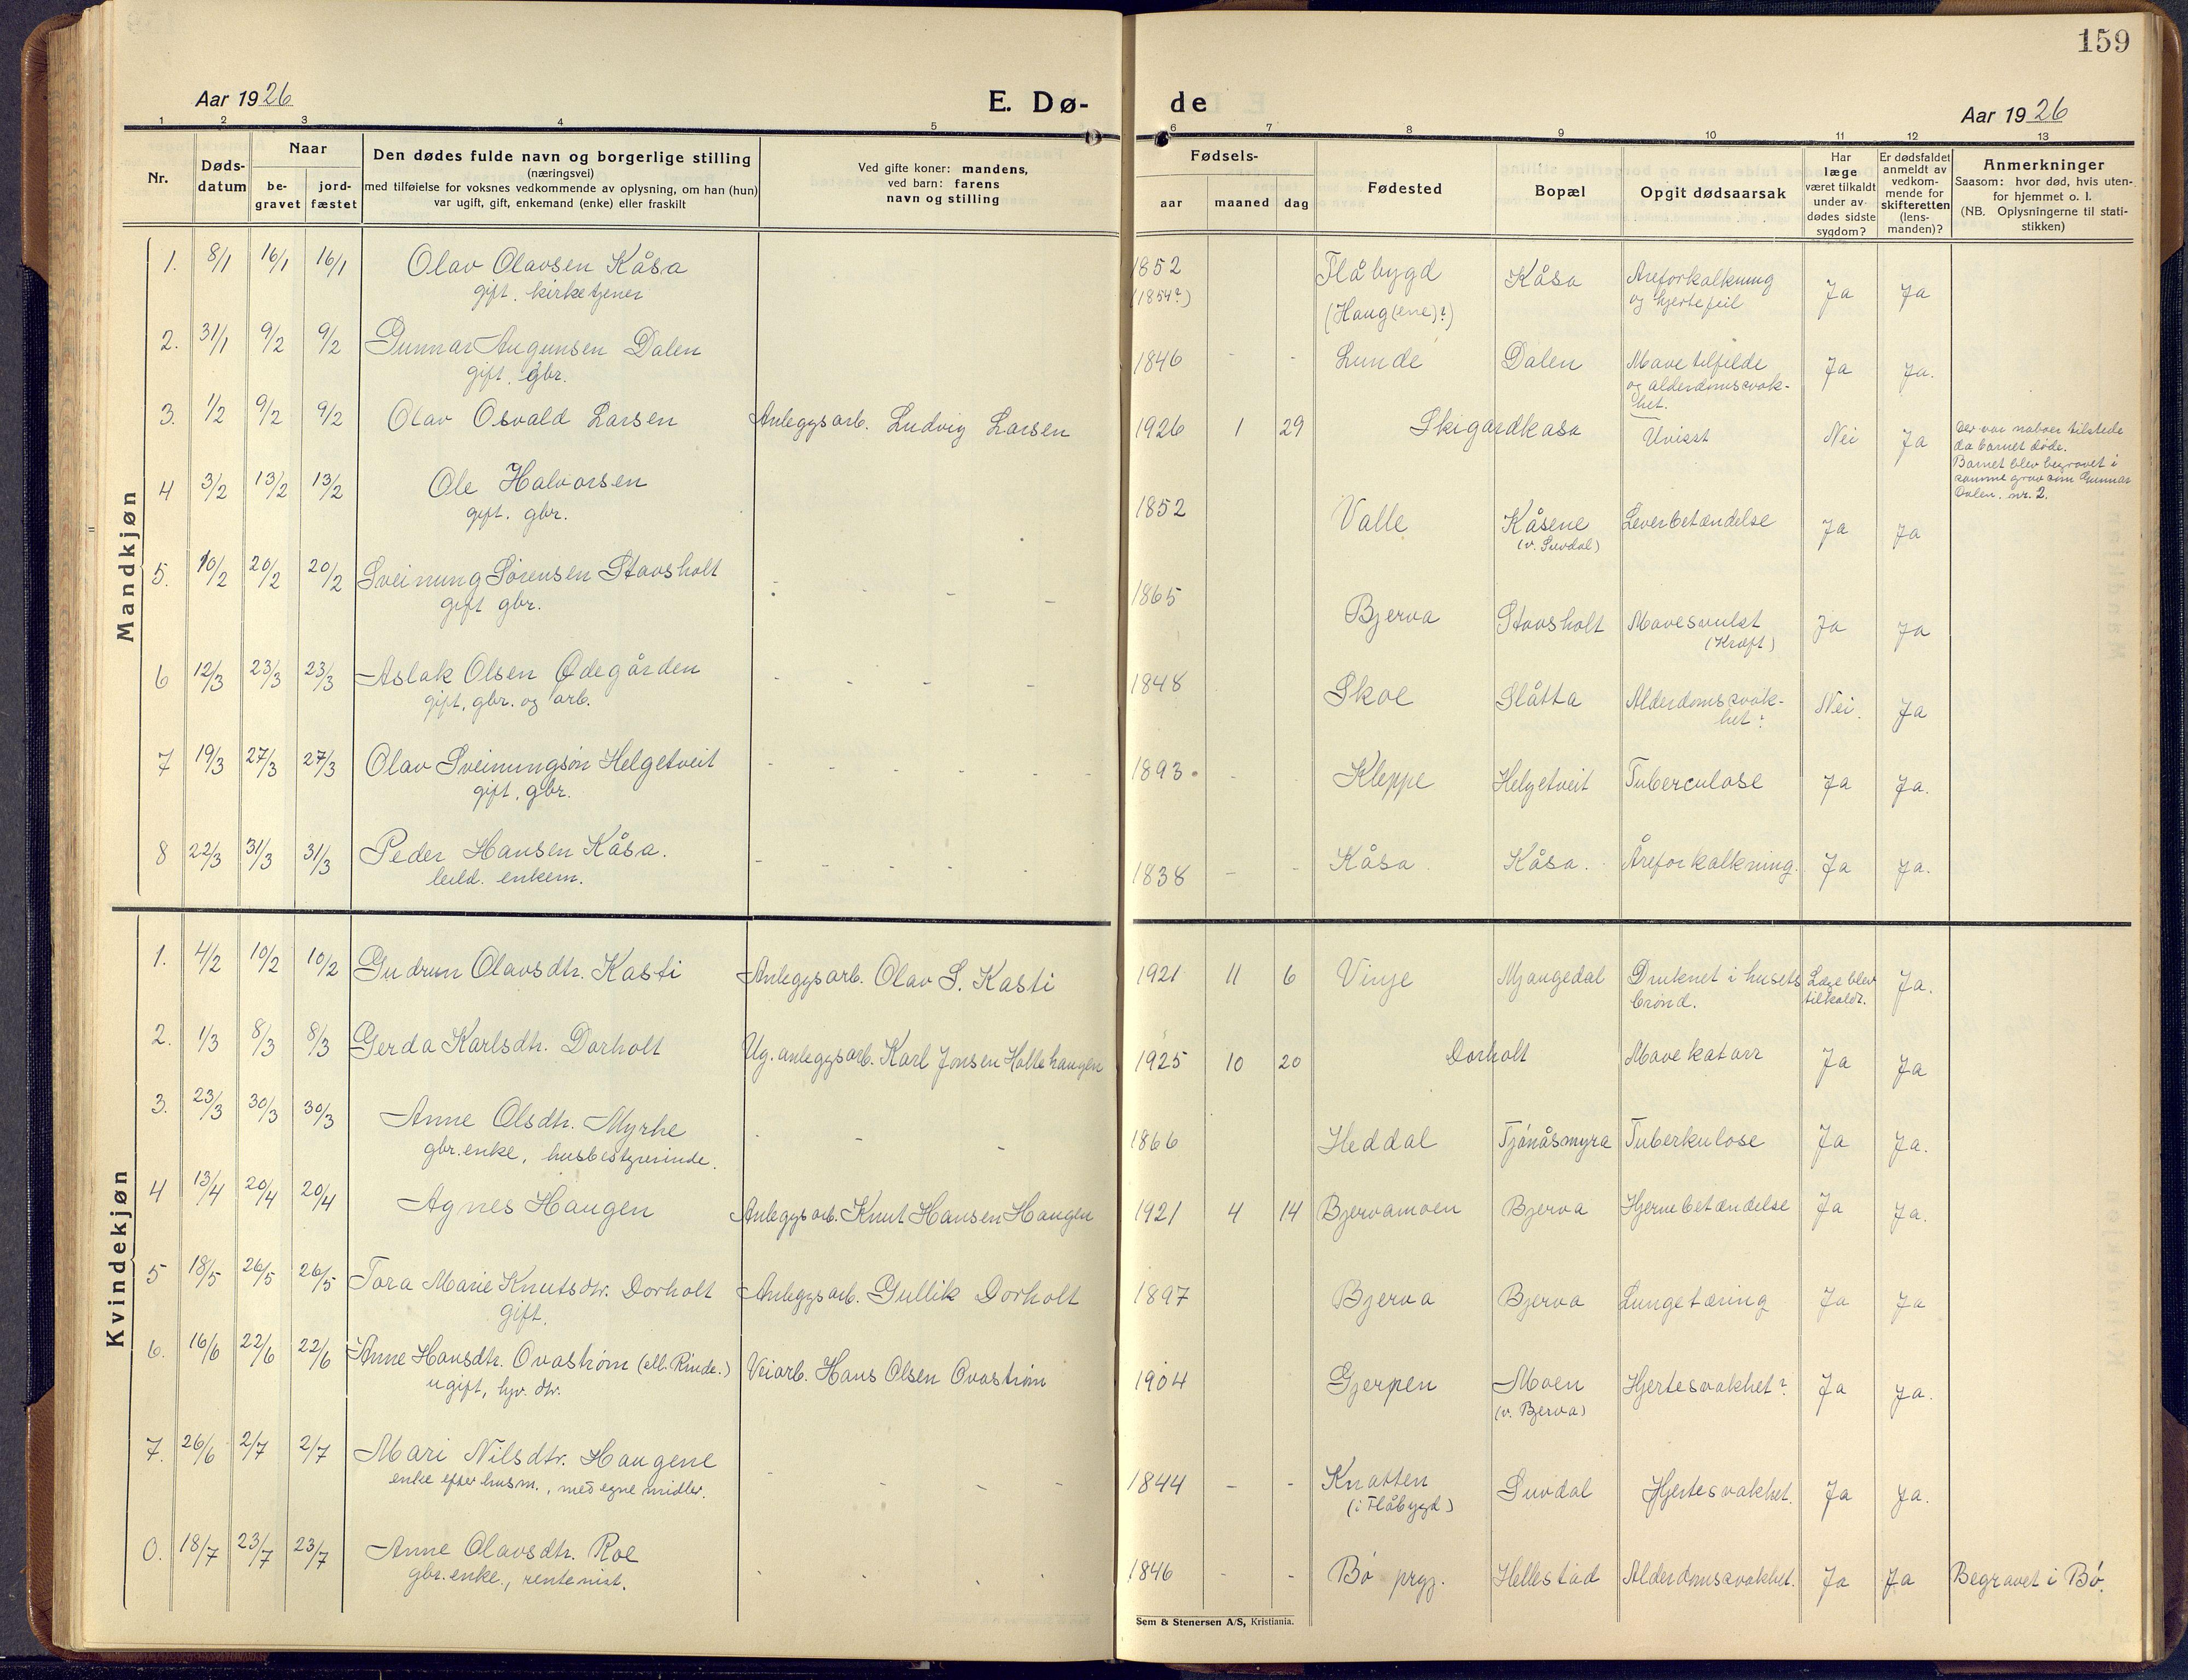 SAKO, Lunde kirkebøker, F/Fa/L0006: Ministerialbok nr. I 6, 1922-1940, s. 159